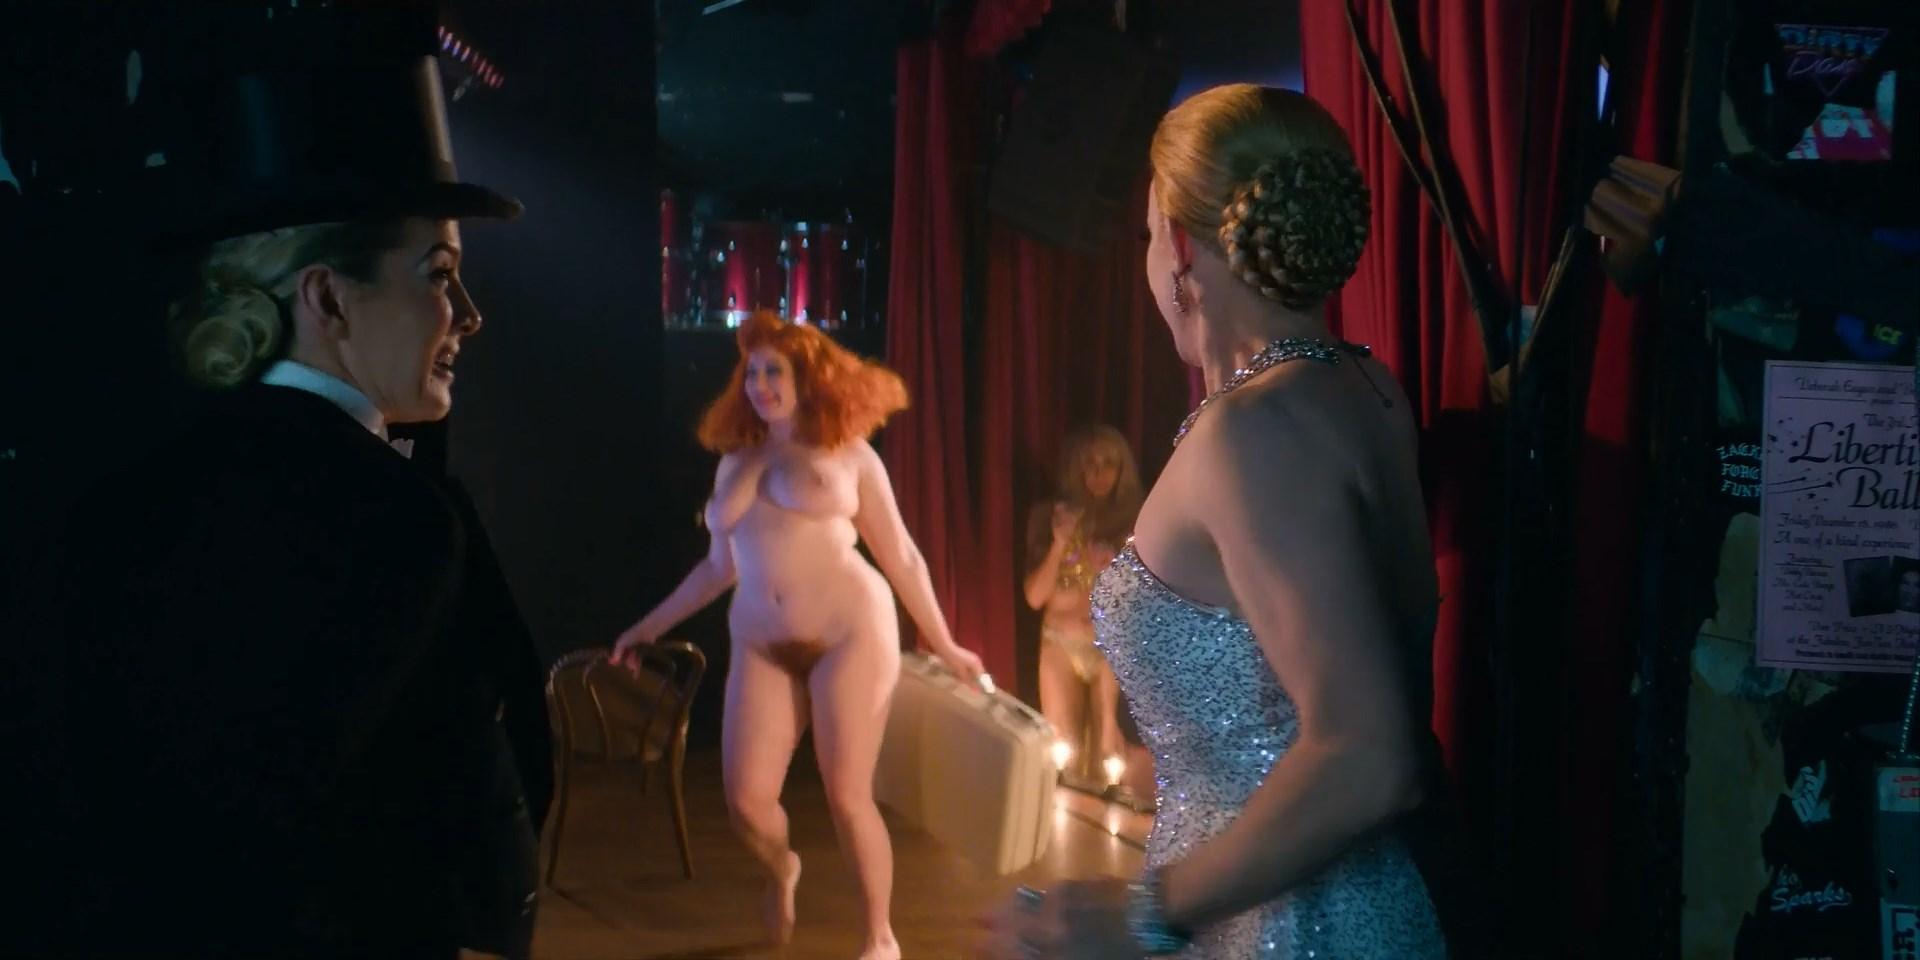 Geena Davis sexy, Kasia Szarek nude - Glow s03e09 (2019)